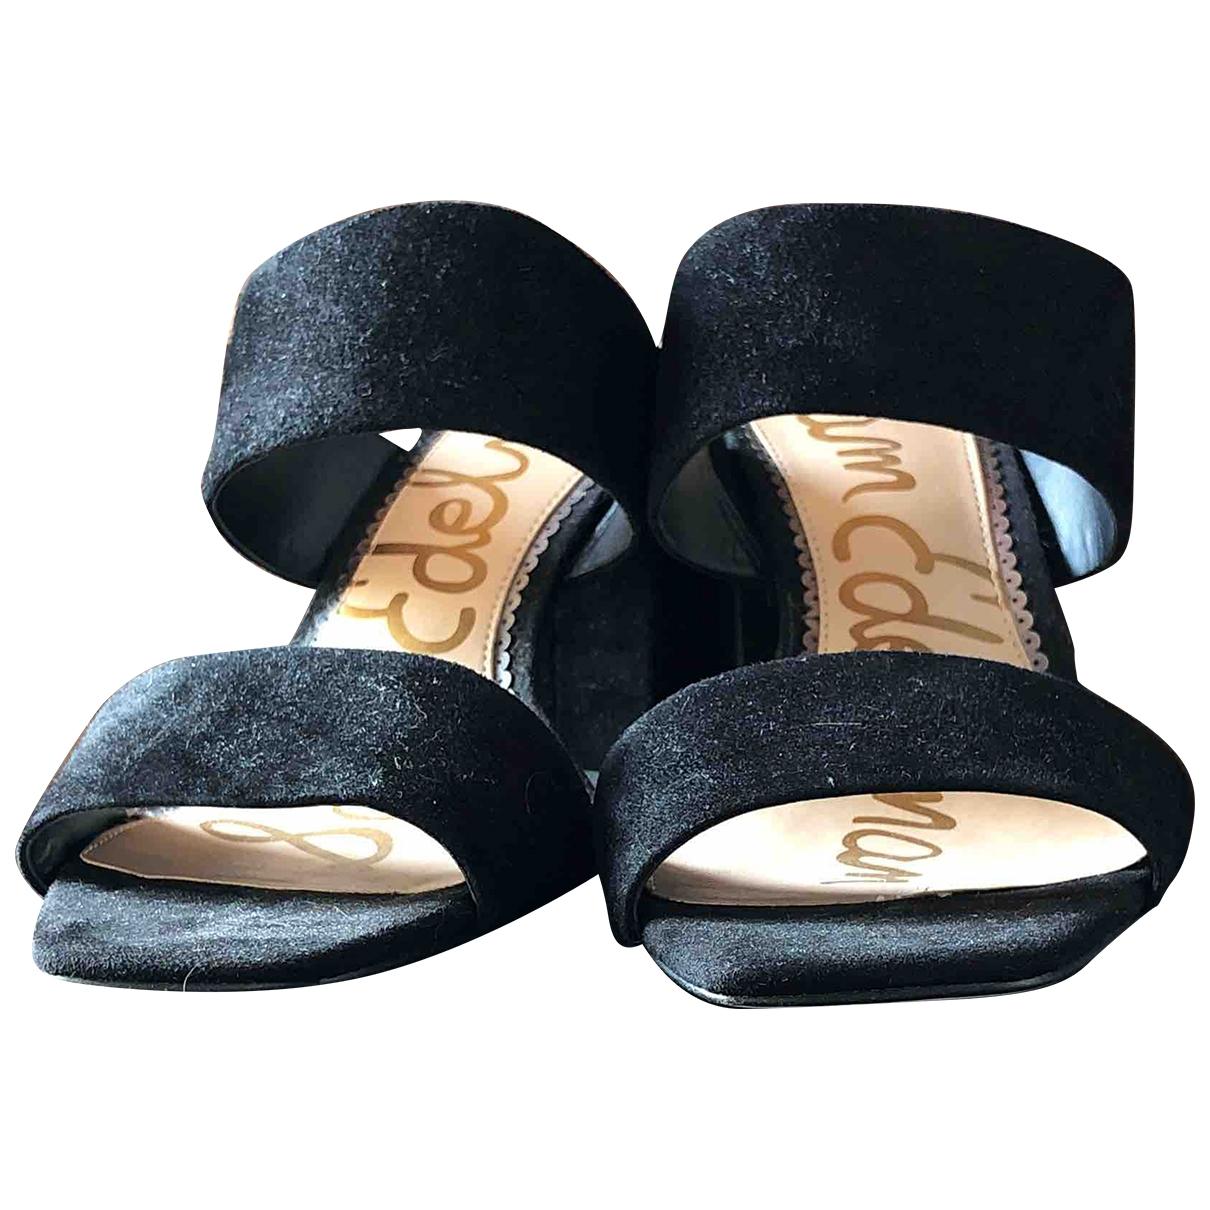 Sam Edelman \N Black Suede Sandals for Women 39.5 IT